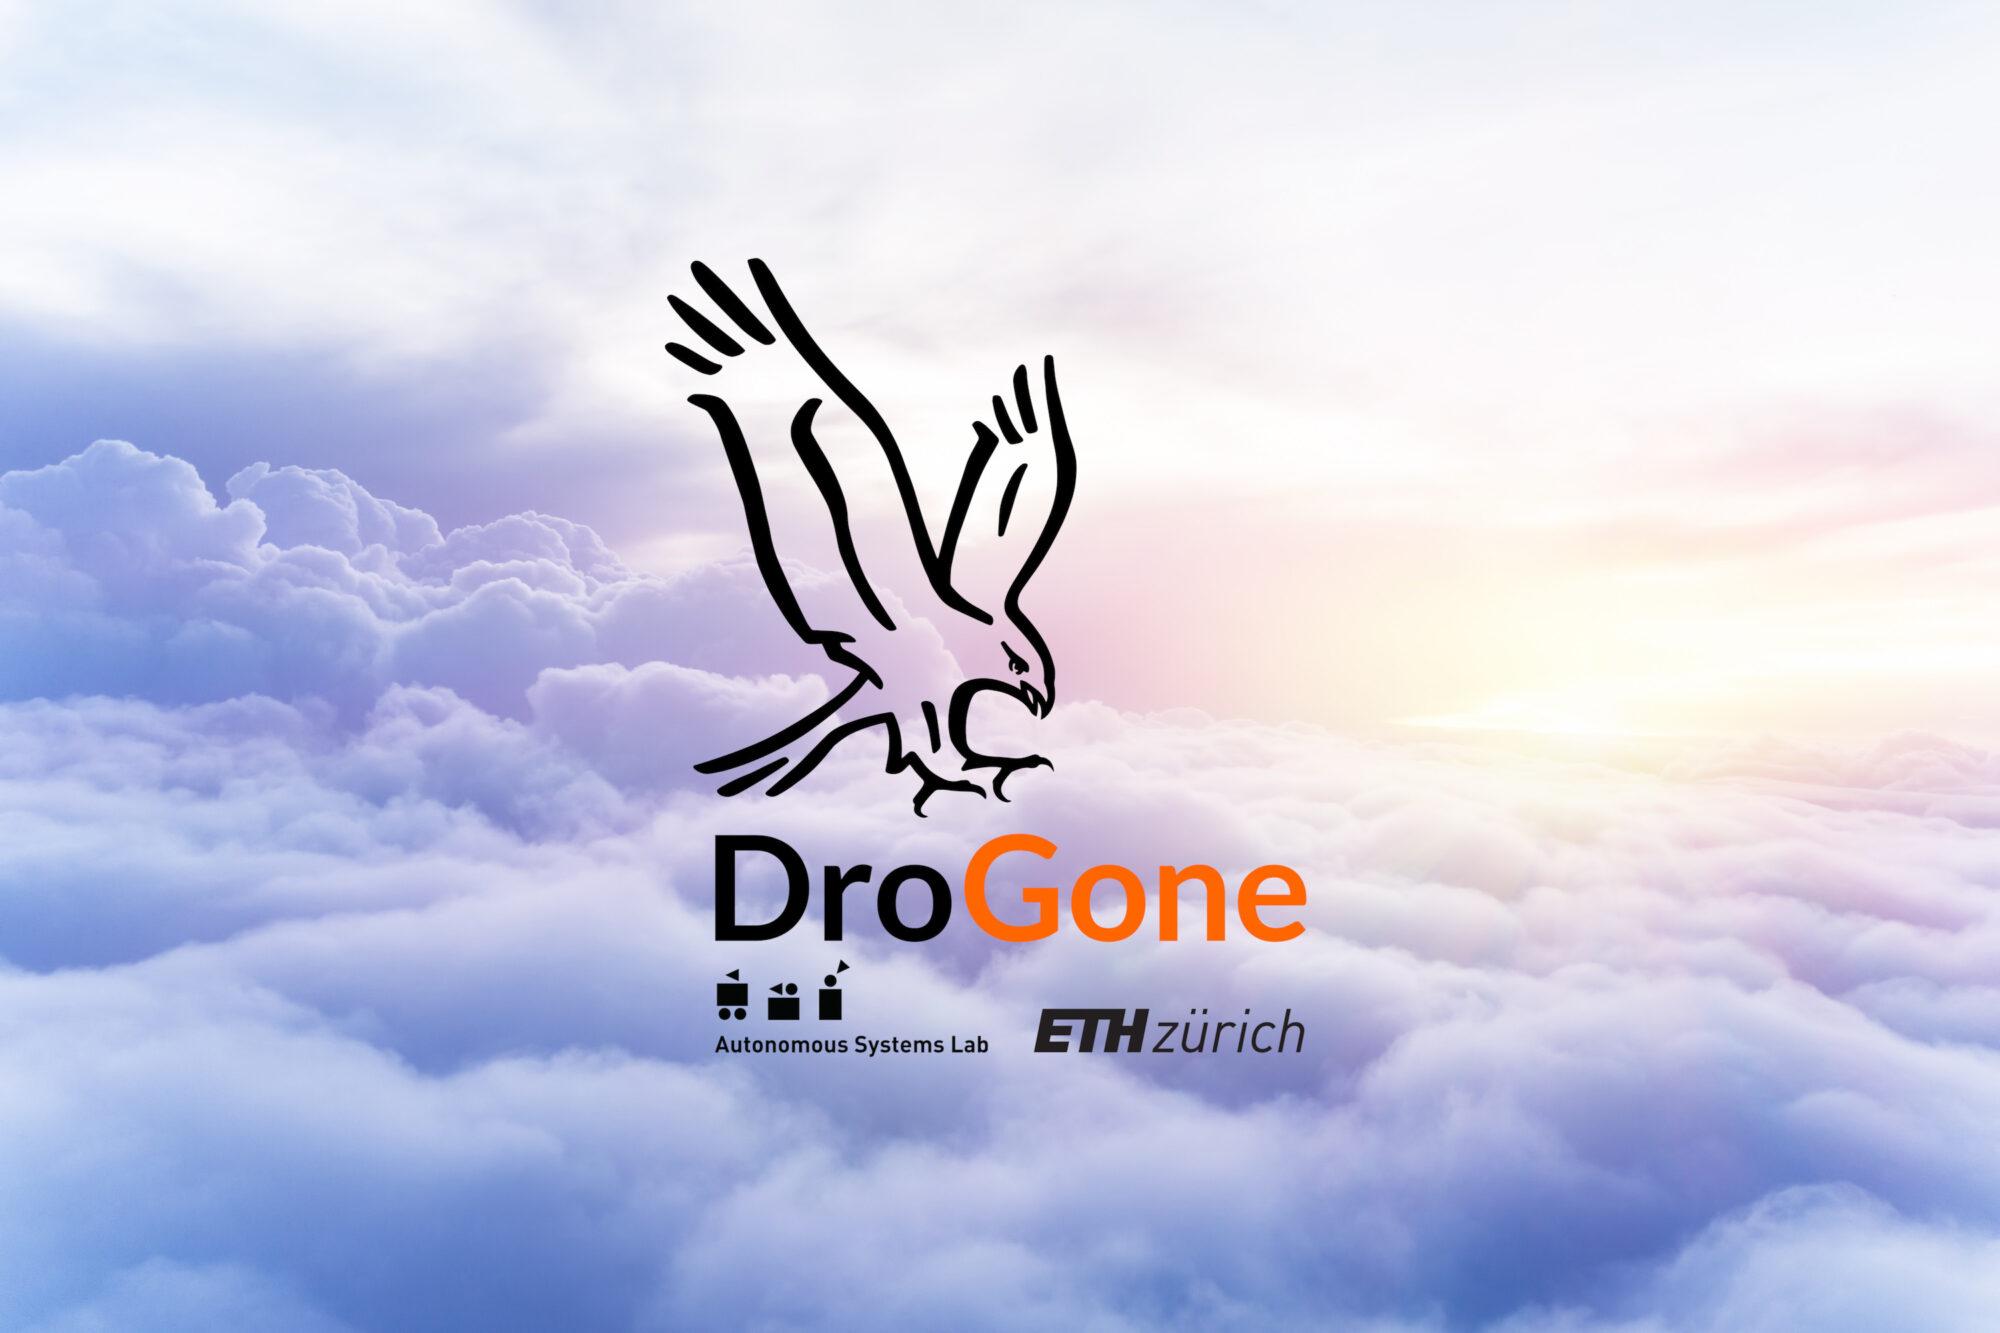 Fokusprojekt DroGone